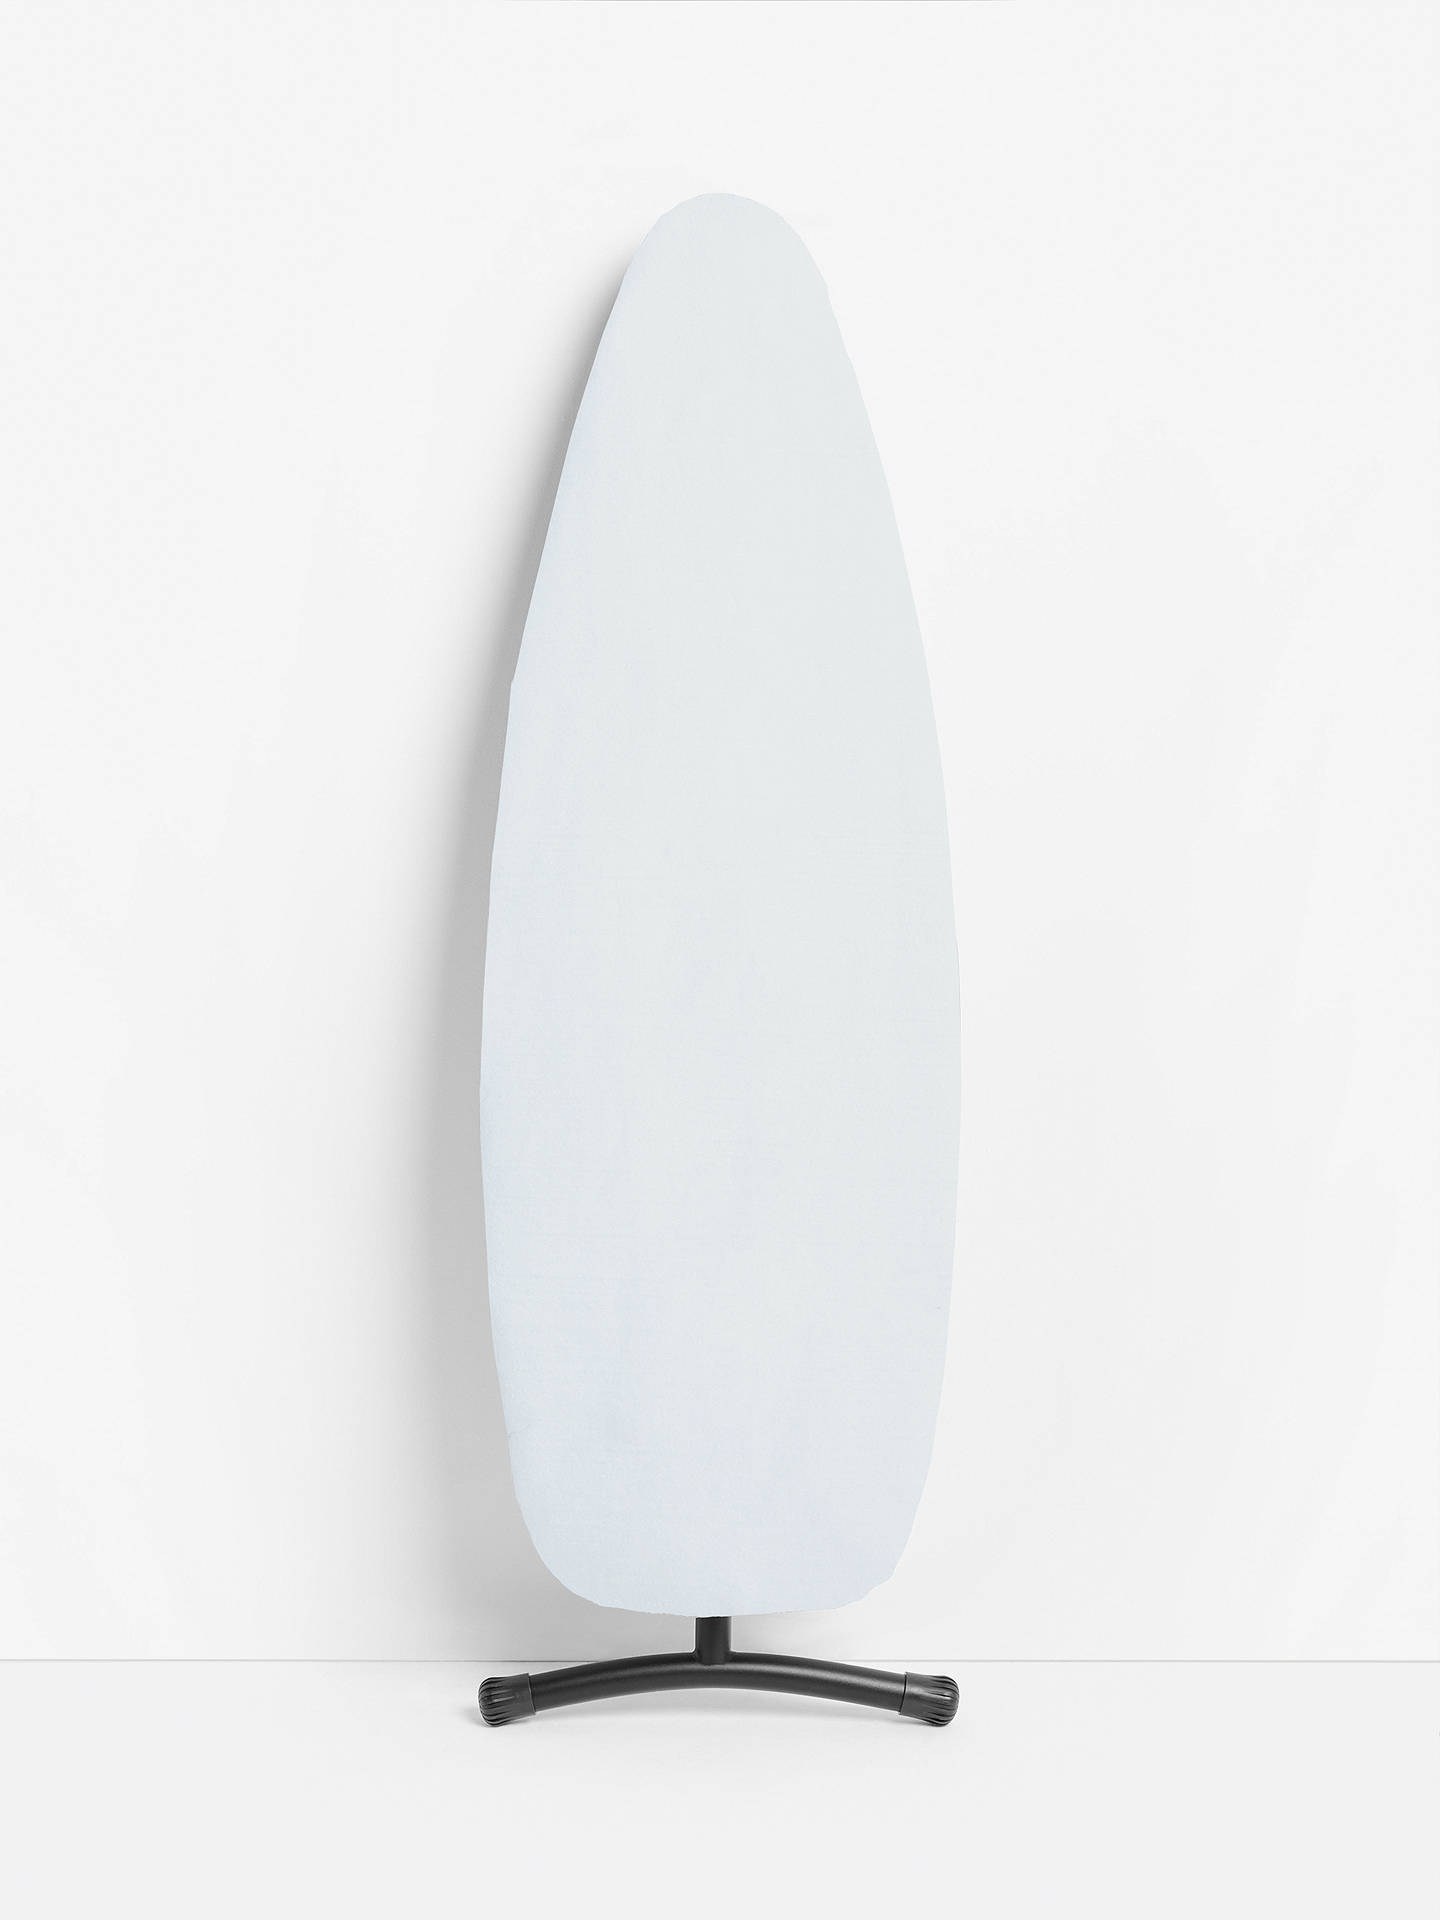 2cc97dc82fc6 Buy John Lewis & Partners Ironing Board Padding Online at johnlewis.com